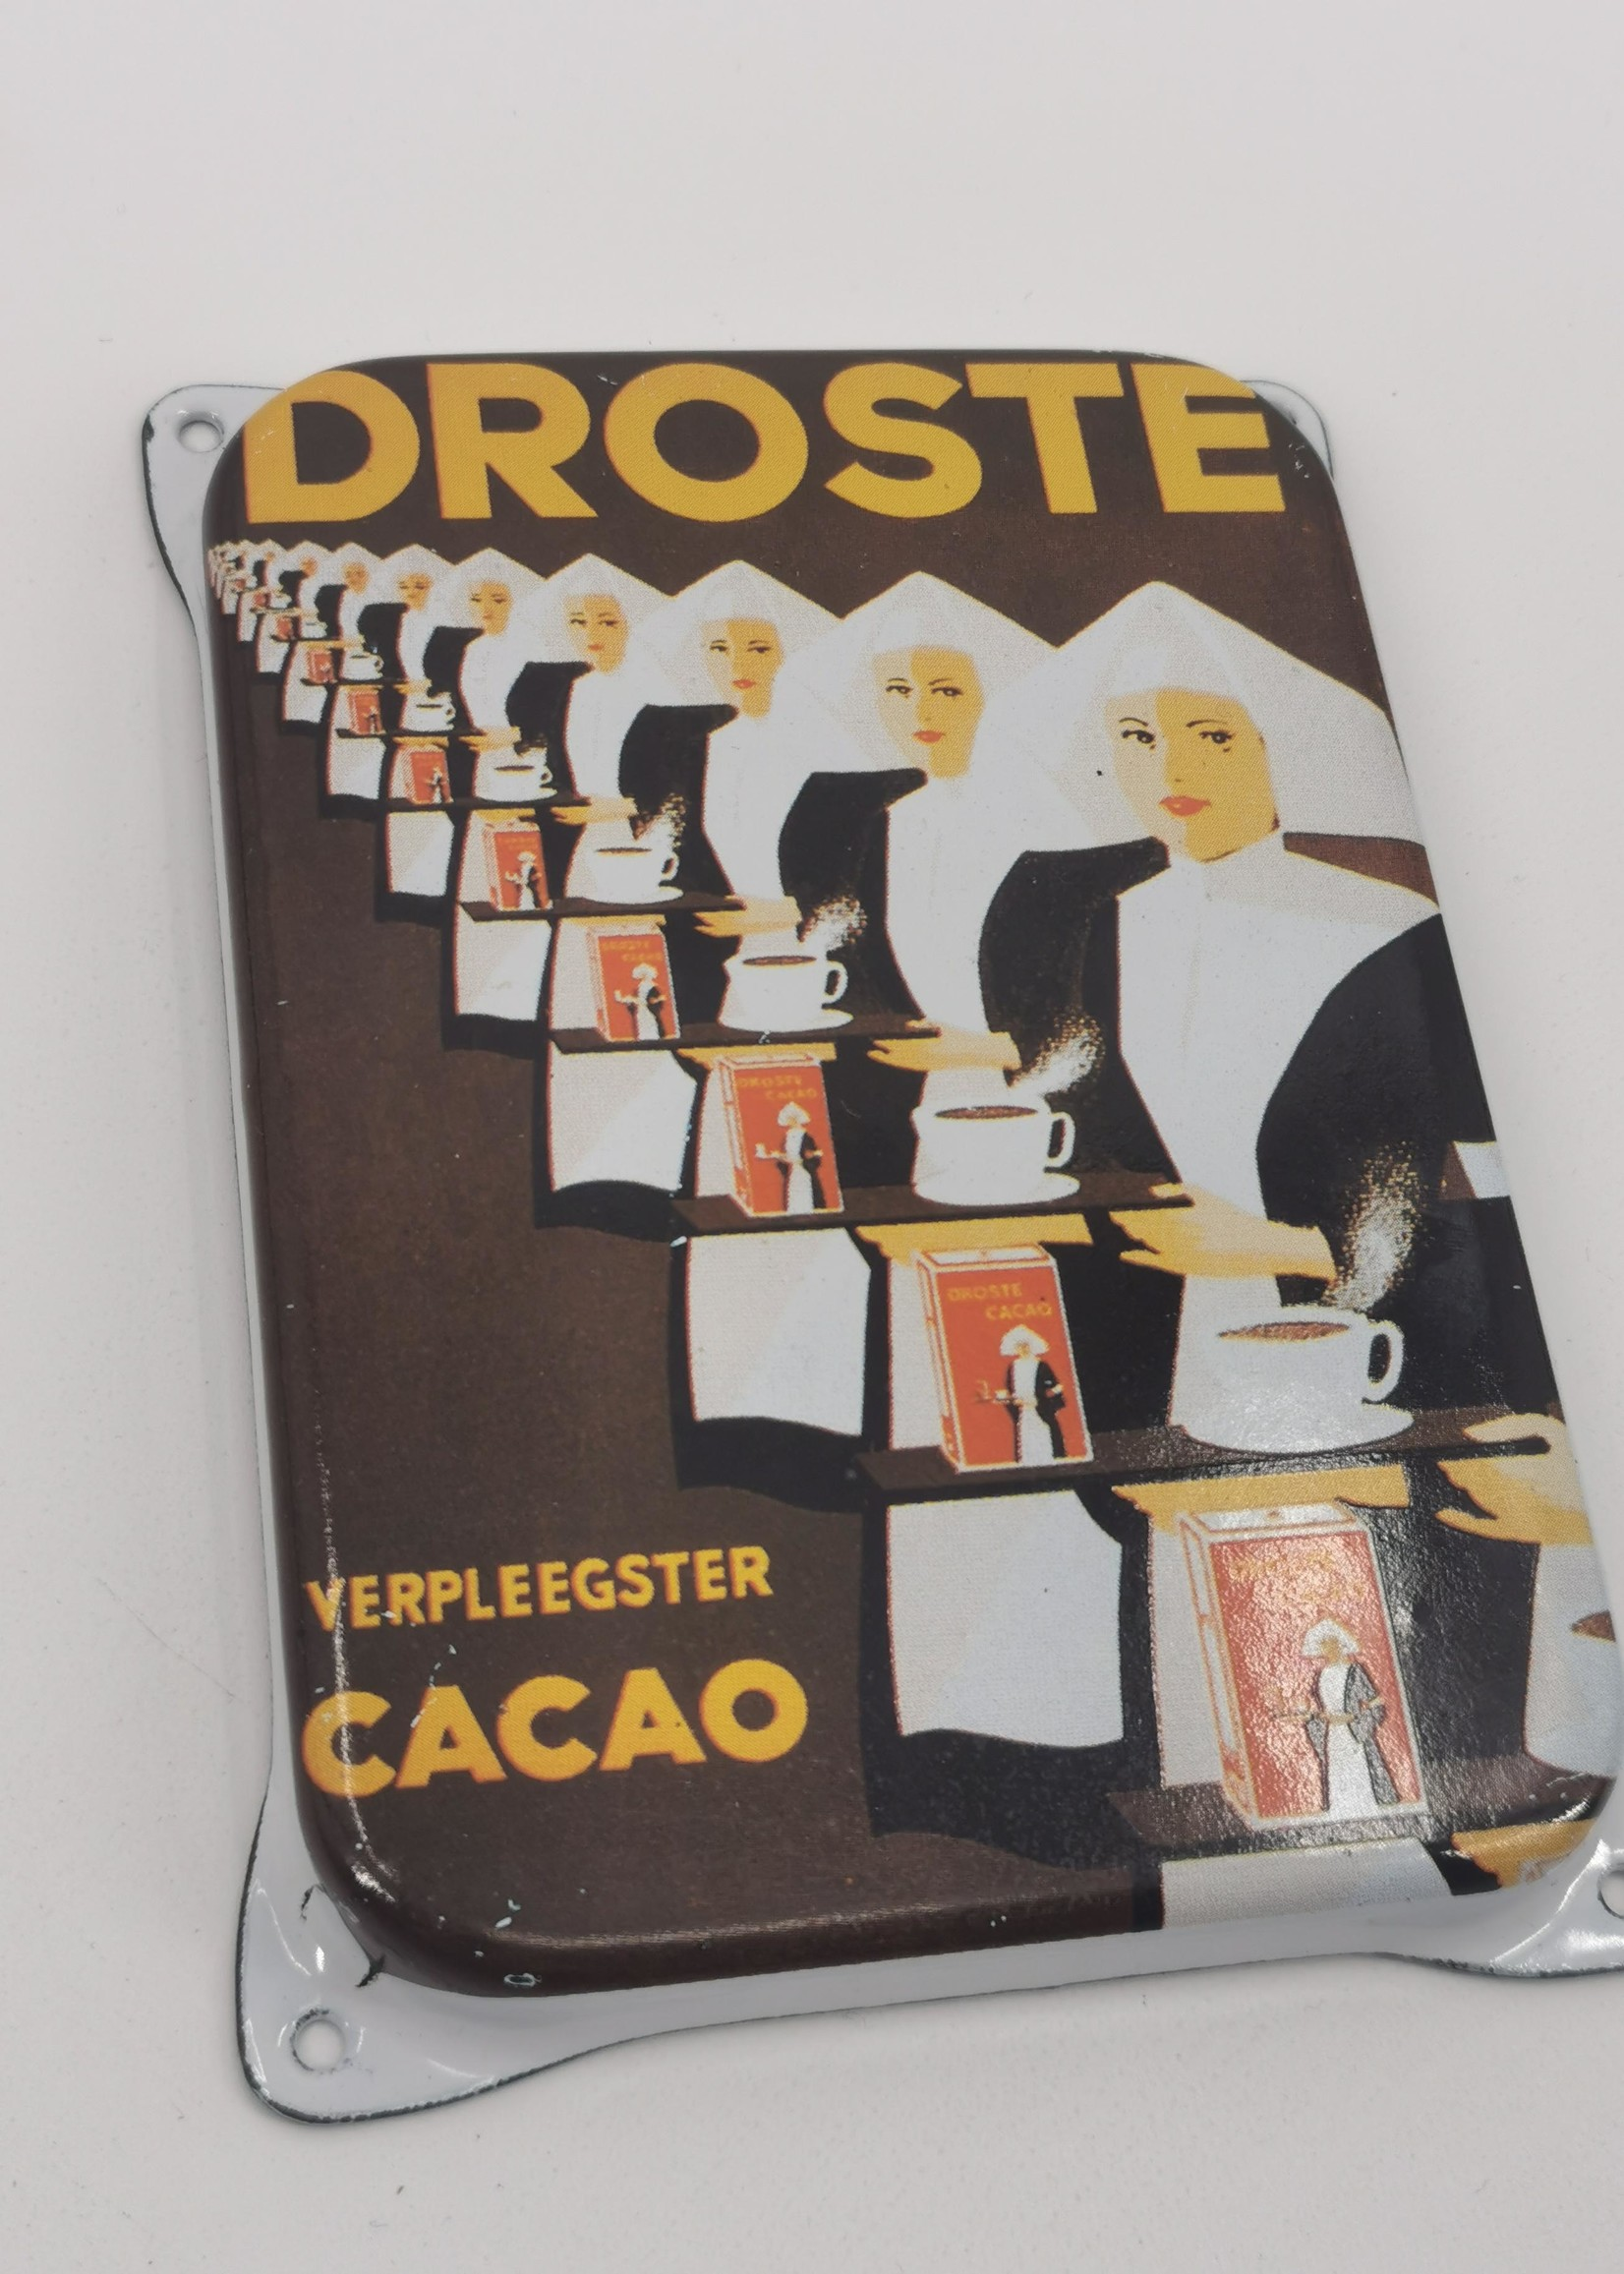 Droste chocolade deurpostje